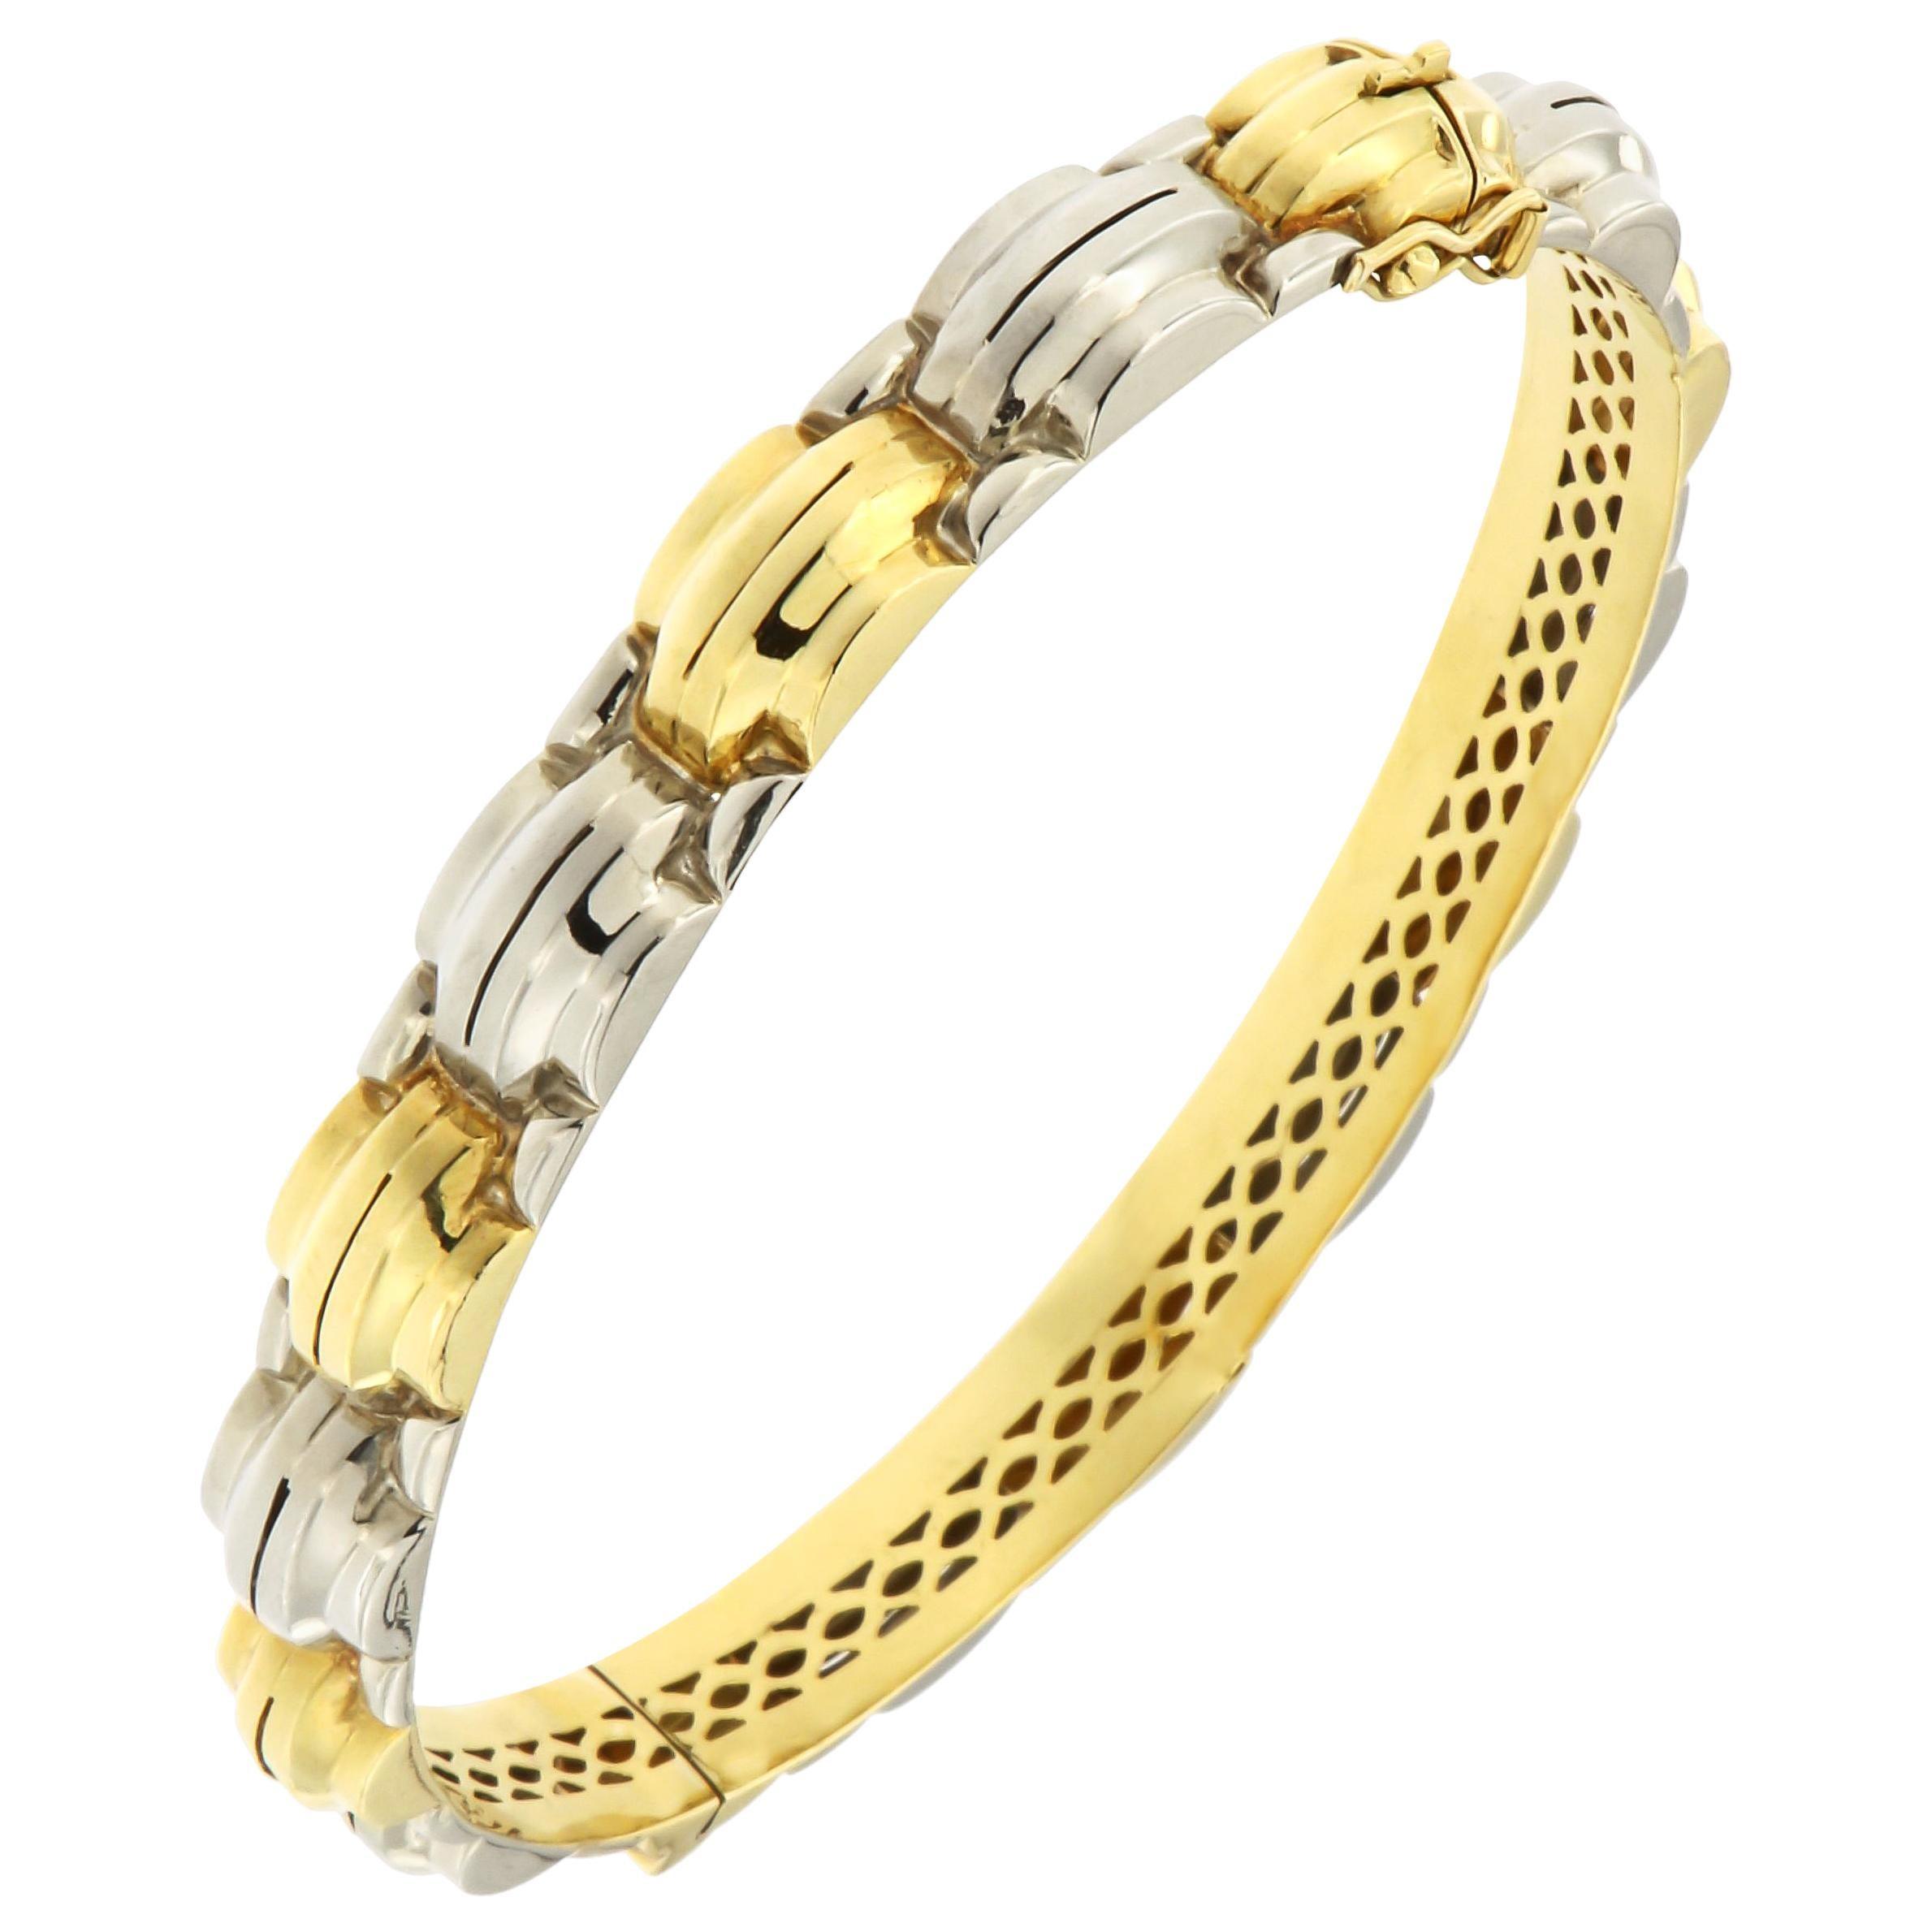 18 Karat White Yellow Gold Rigid Cuff Bracelet Handcrafted in Italy